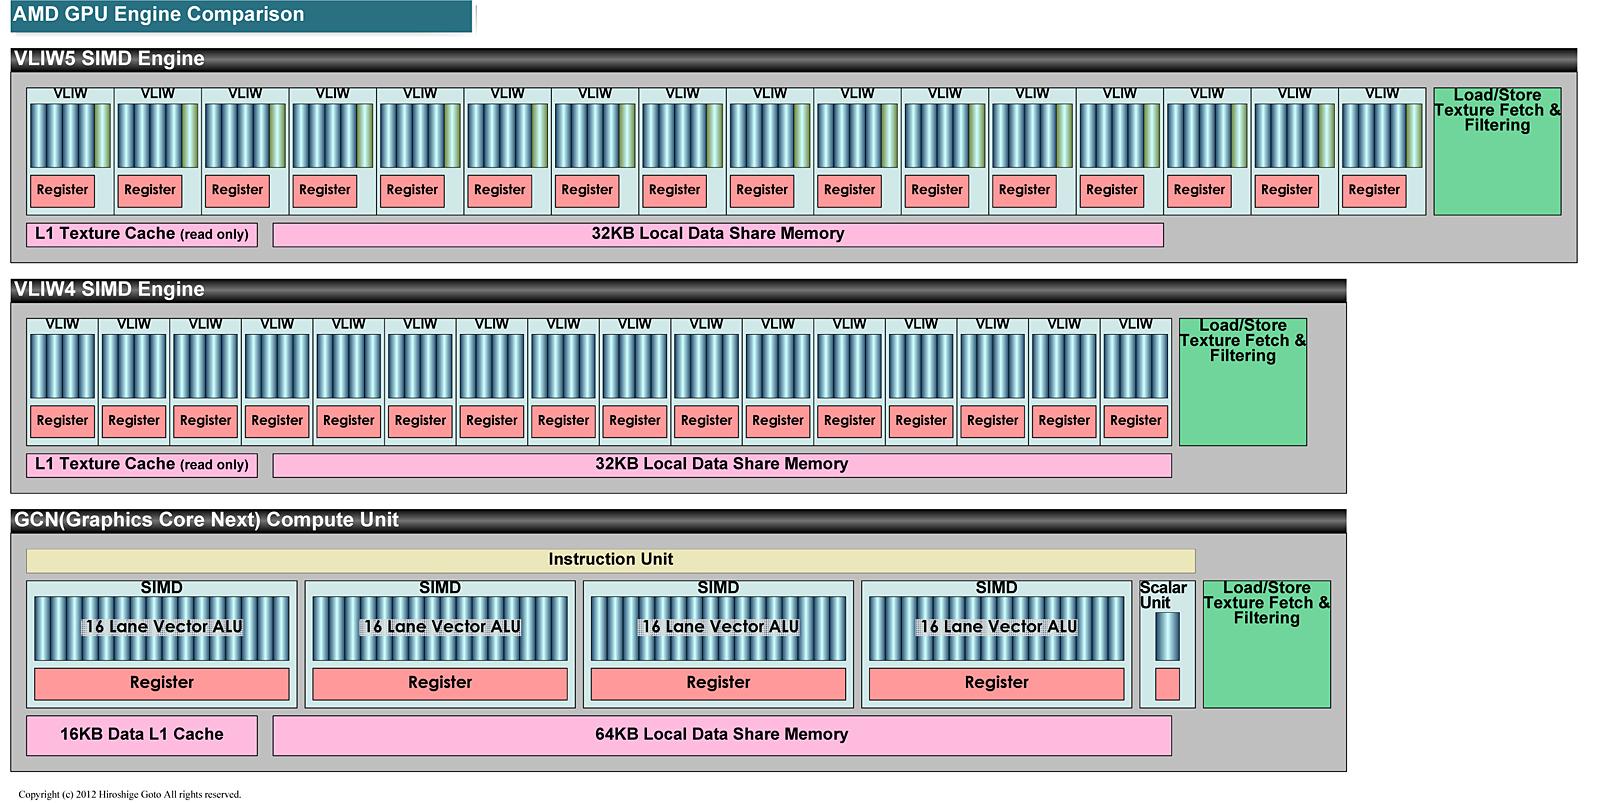 "GPUの比較<br class="""">PDF版は<span class=""img-inline raw""><a href=""/video/pcw/docs/606/220/p1.pdf"" ipw_status=""1"" ipw_linktype=""filelink_raw"" class=""resource"">こちら</a></span>"